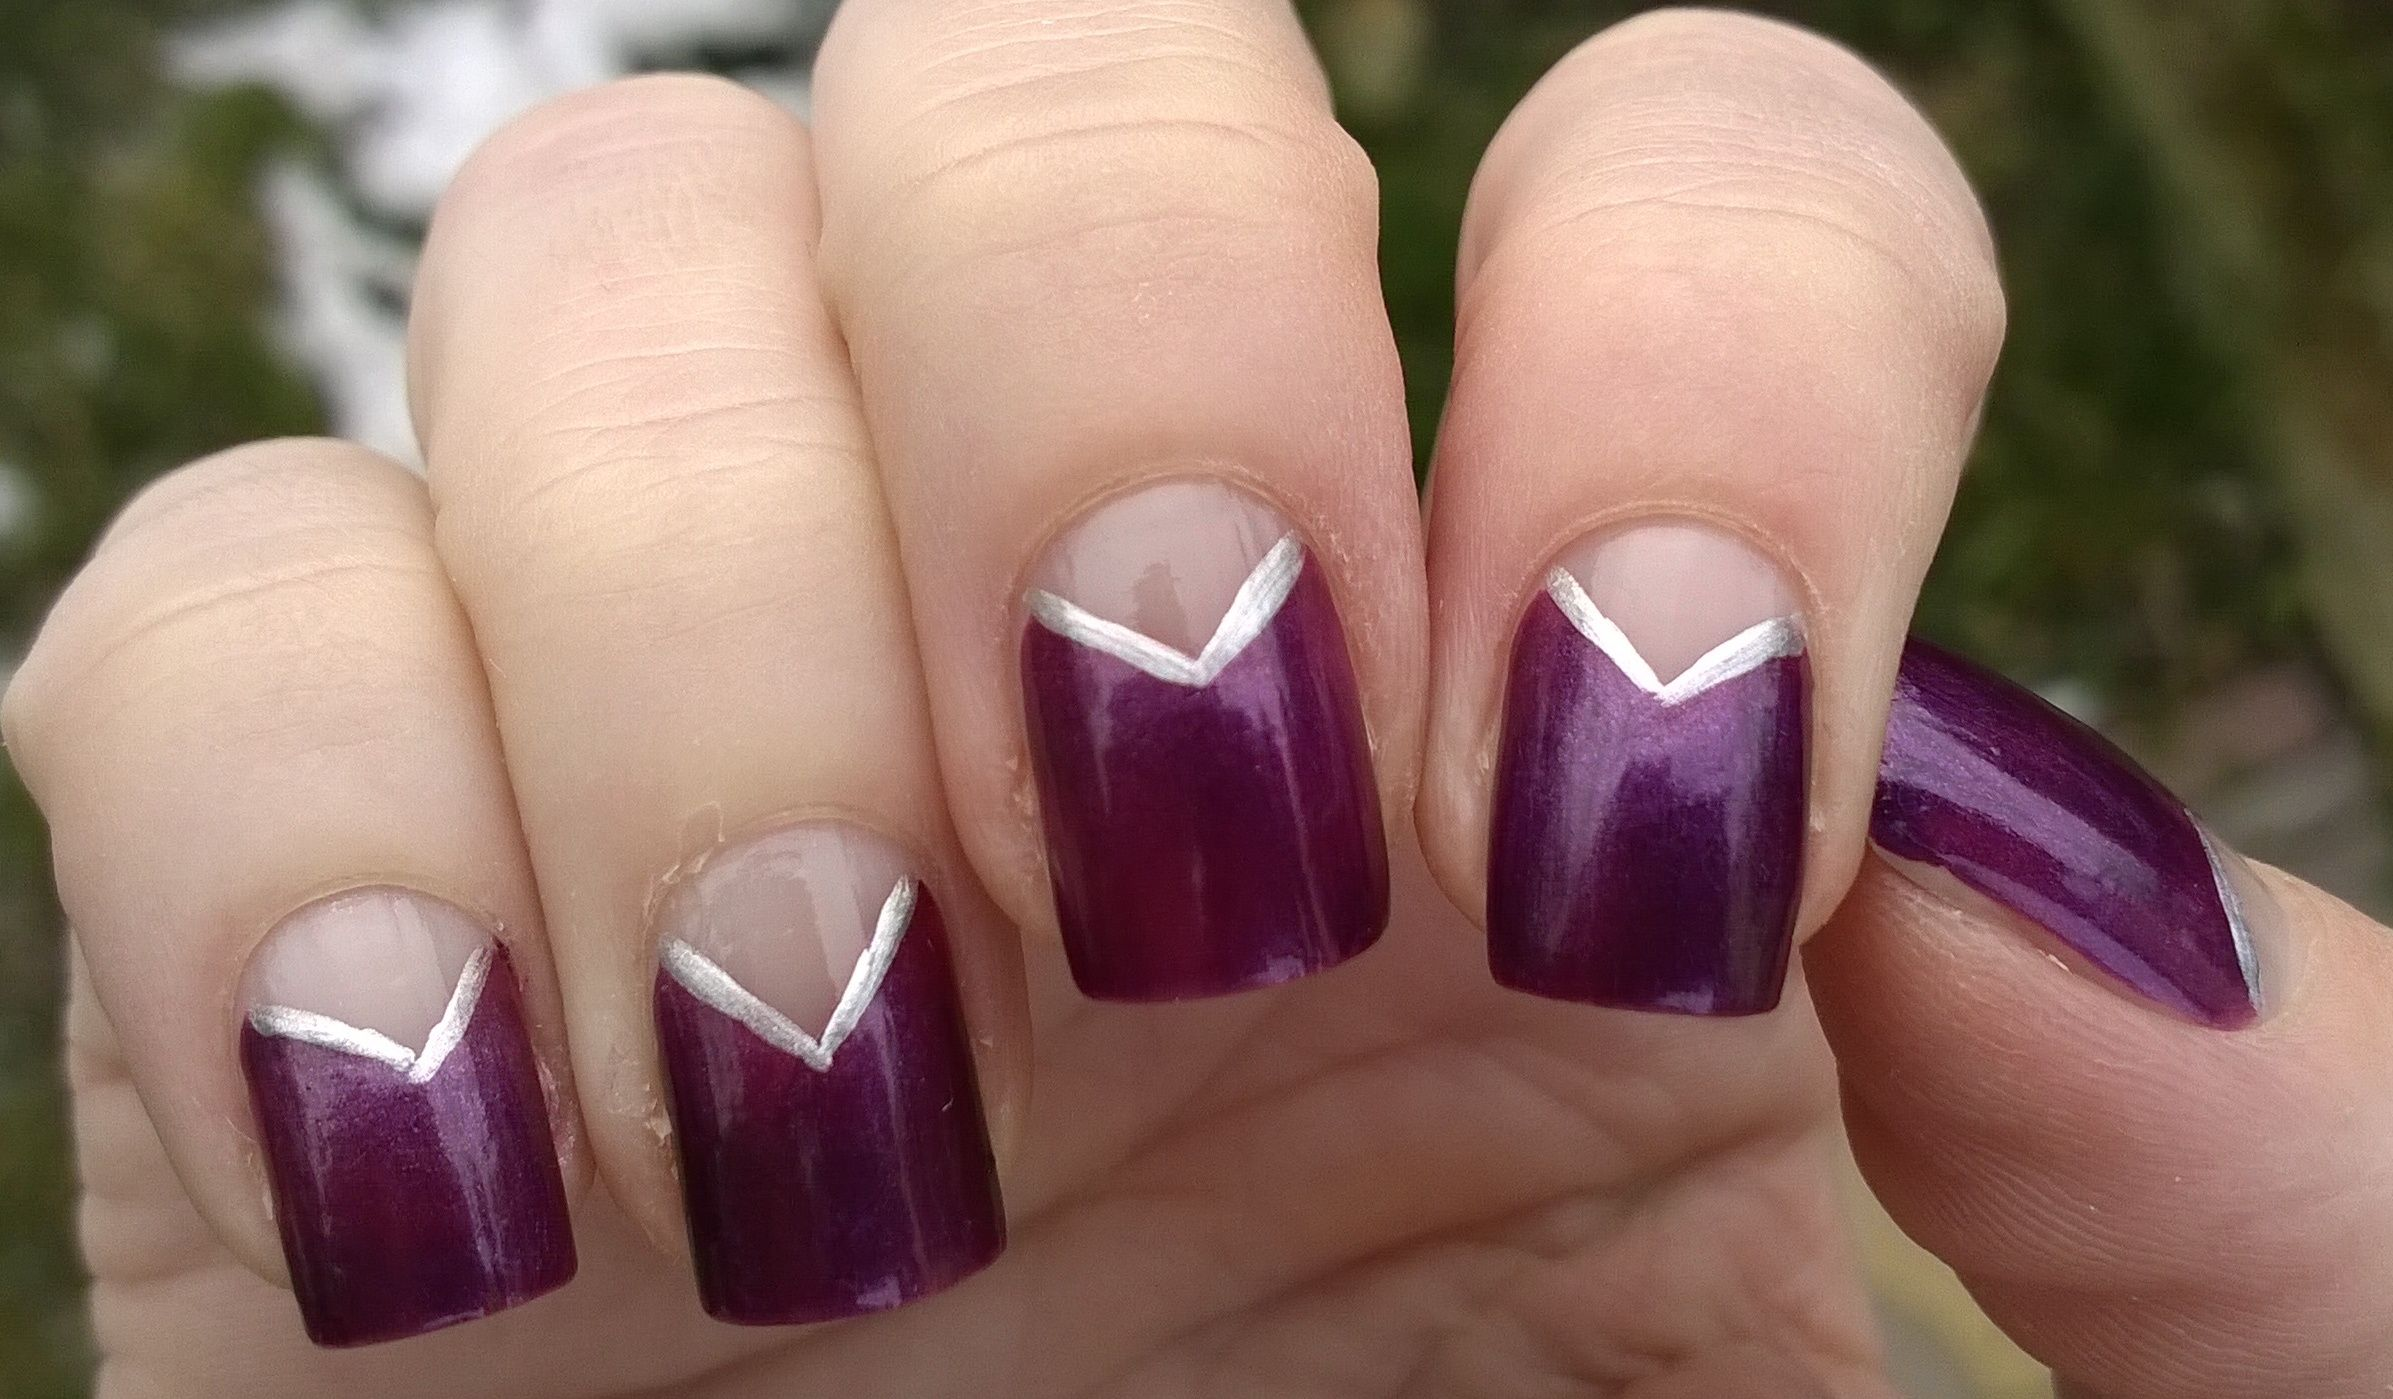 Elegant Nail Designs Lilac And Silver V Nail Art Httpswww